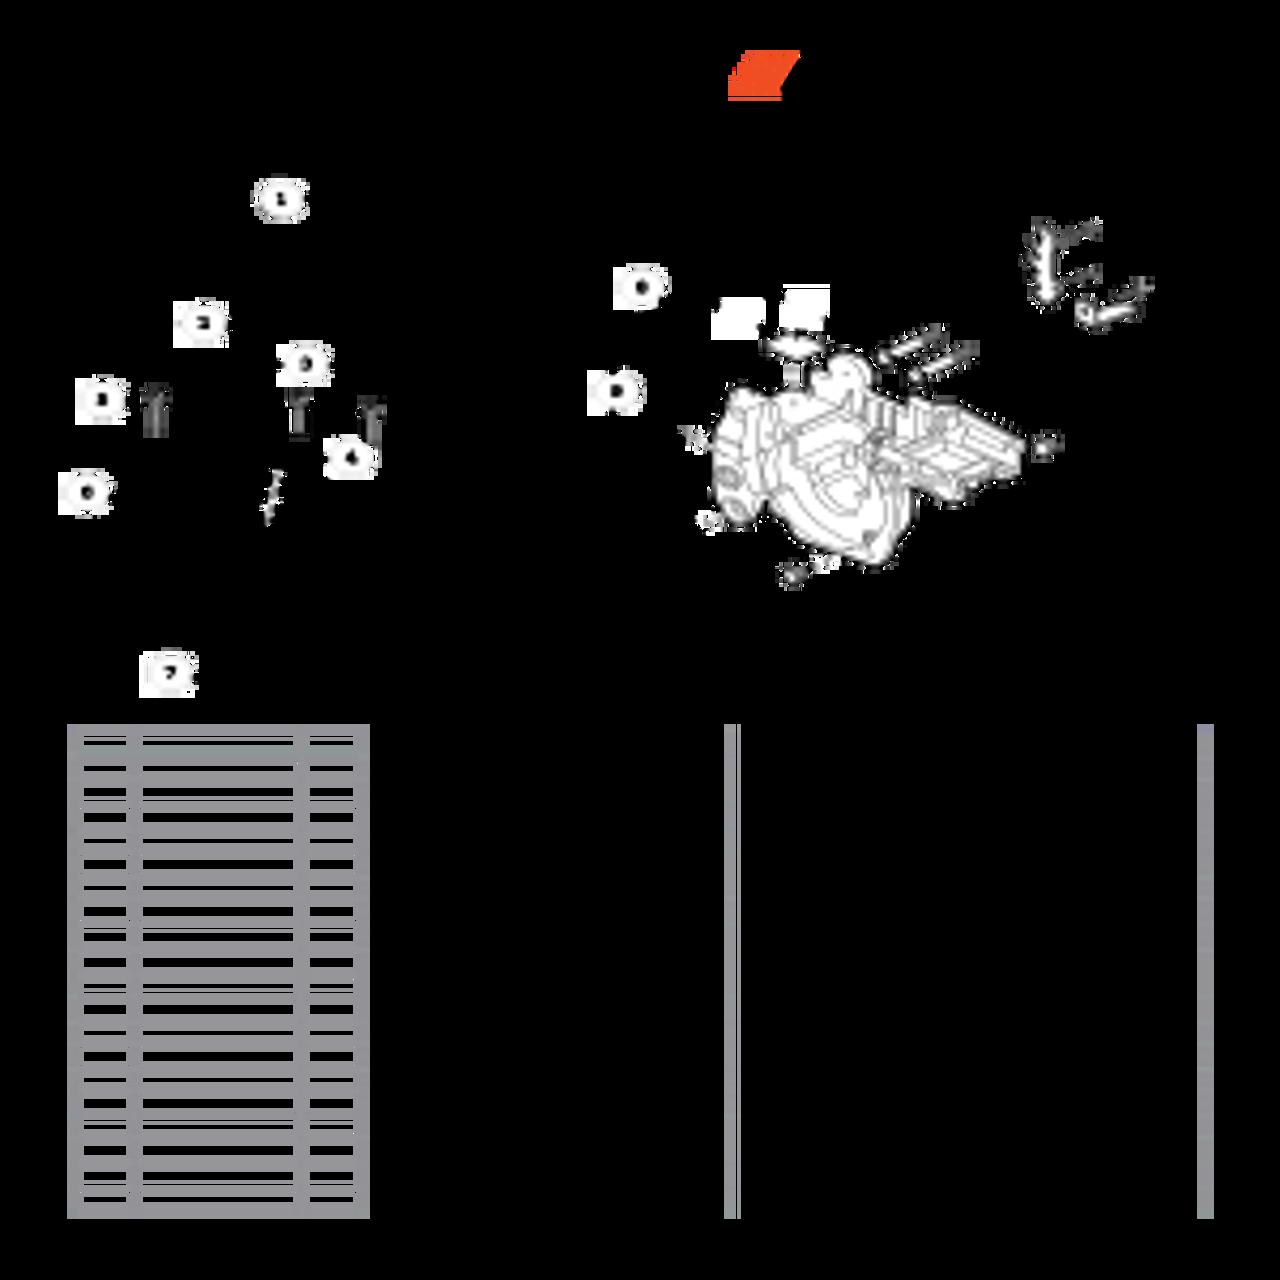 CS-400F SN C27812001001 - C27812999999 - Engine Covers Parts lookup